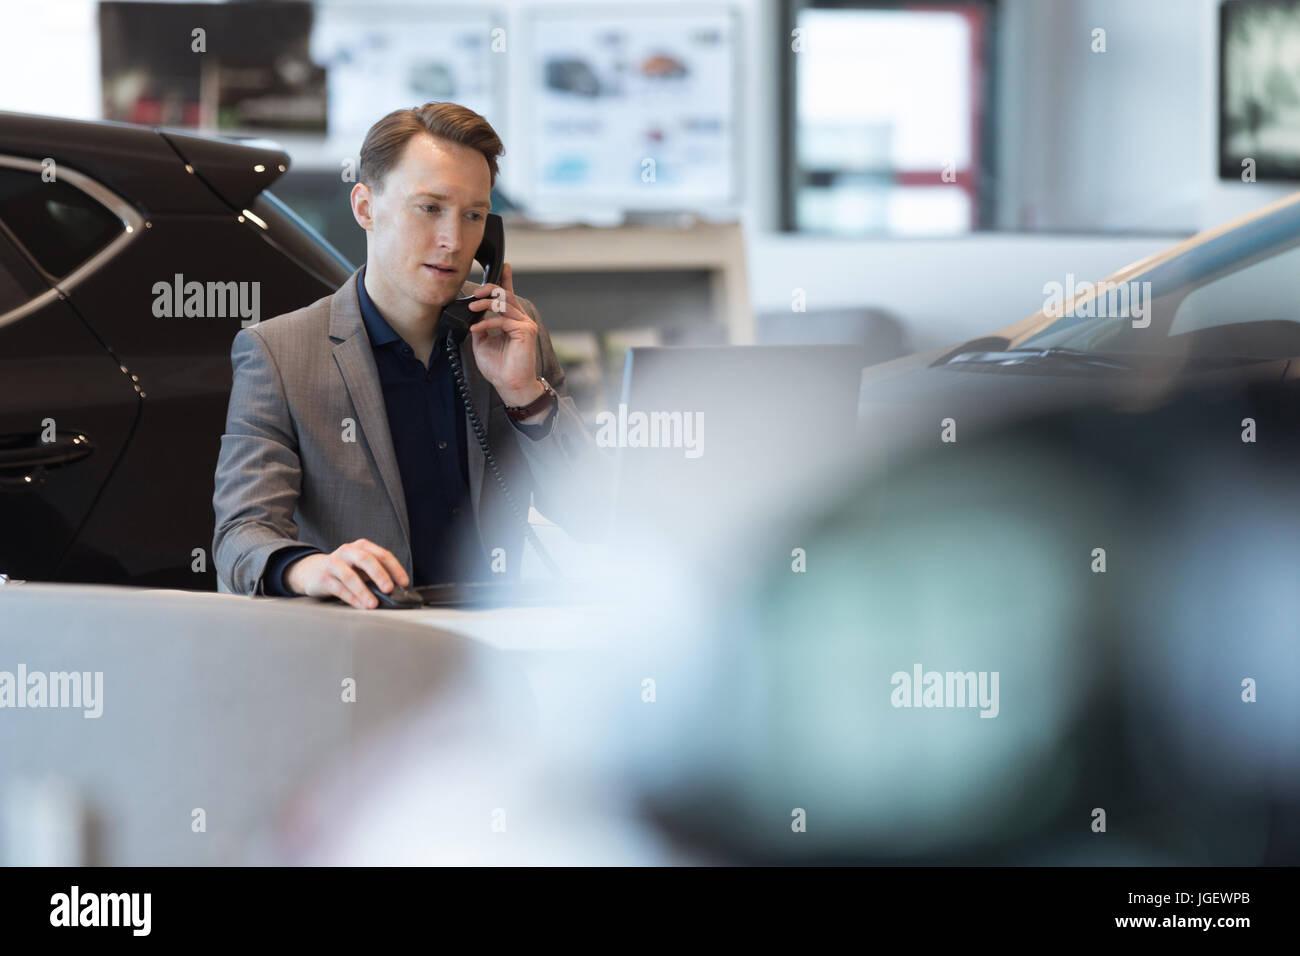 Car salesperson talking on landline phone - Stock Image